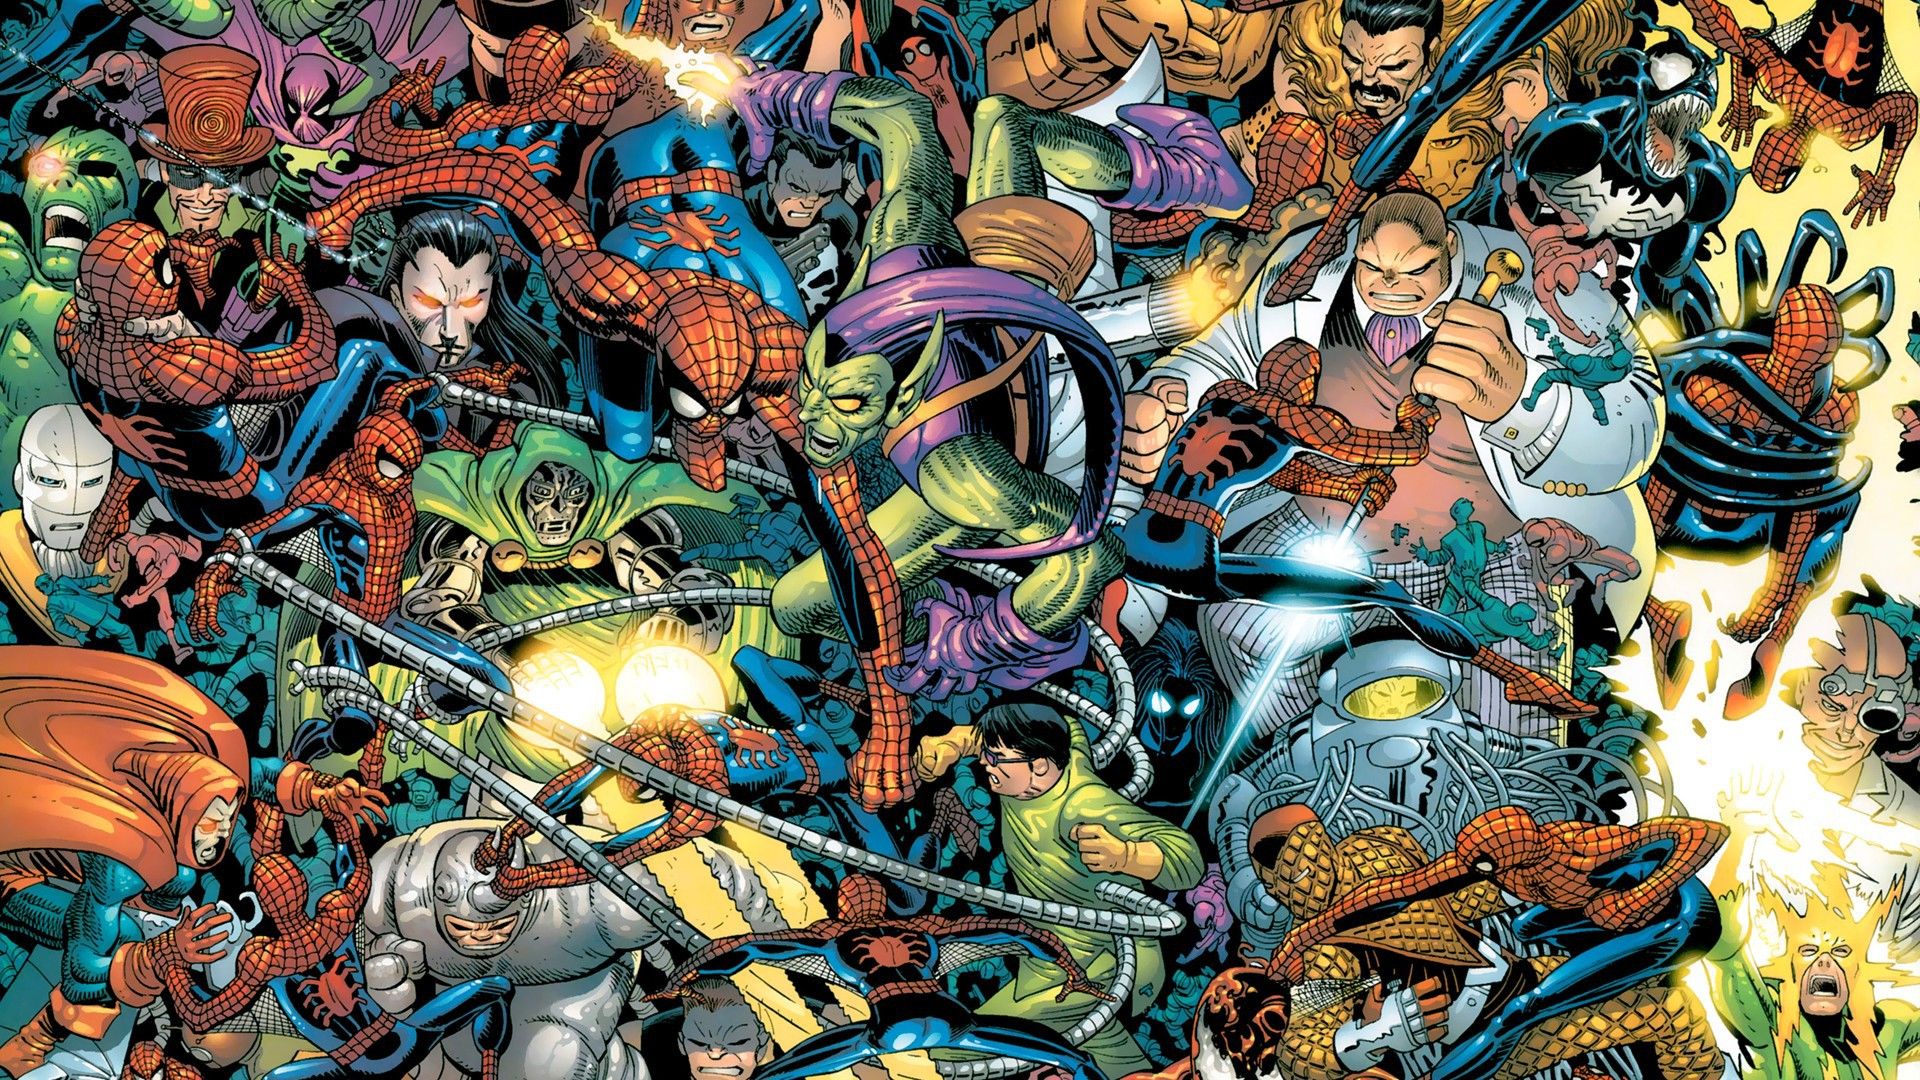 HD Comic Book Wallpaper, Cool Comic Book Backgrounds | 43 Superb